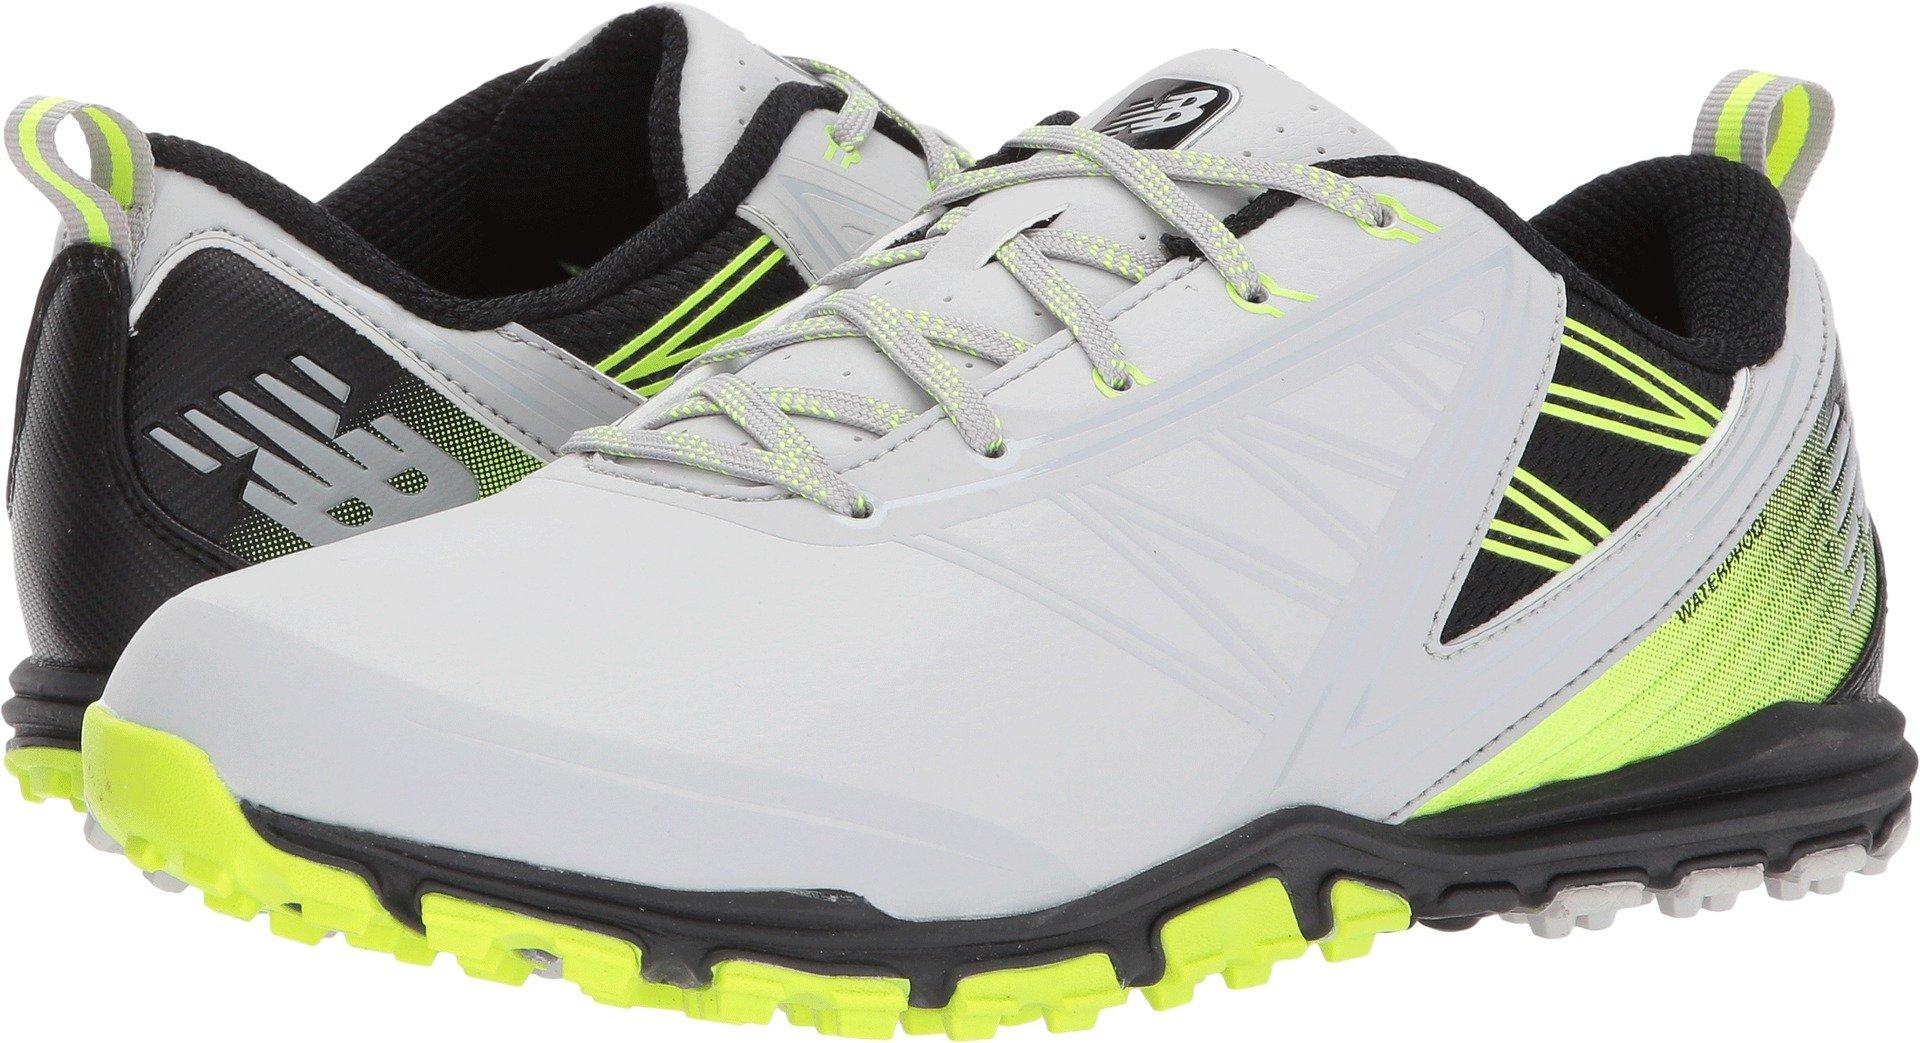 New Balance Men's Minimus SL Golf Shoe, Grey/Green, 7 2E 2E US